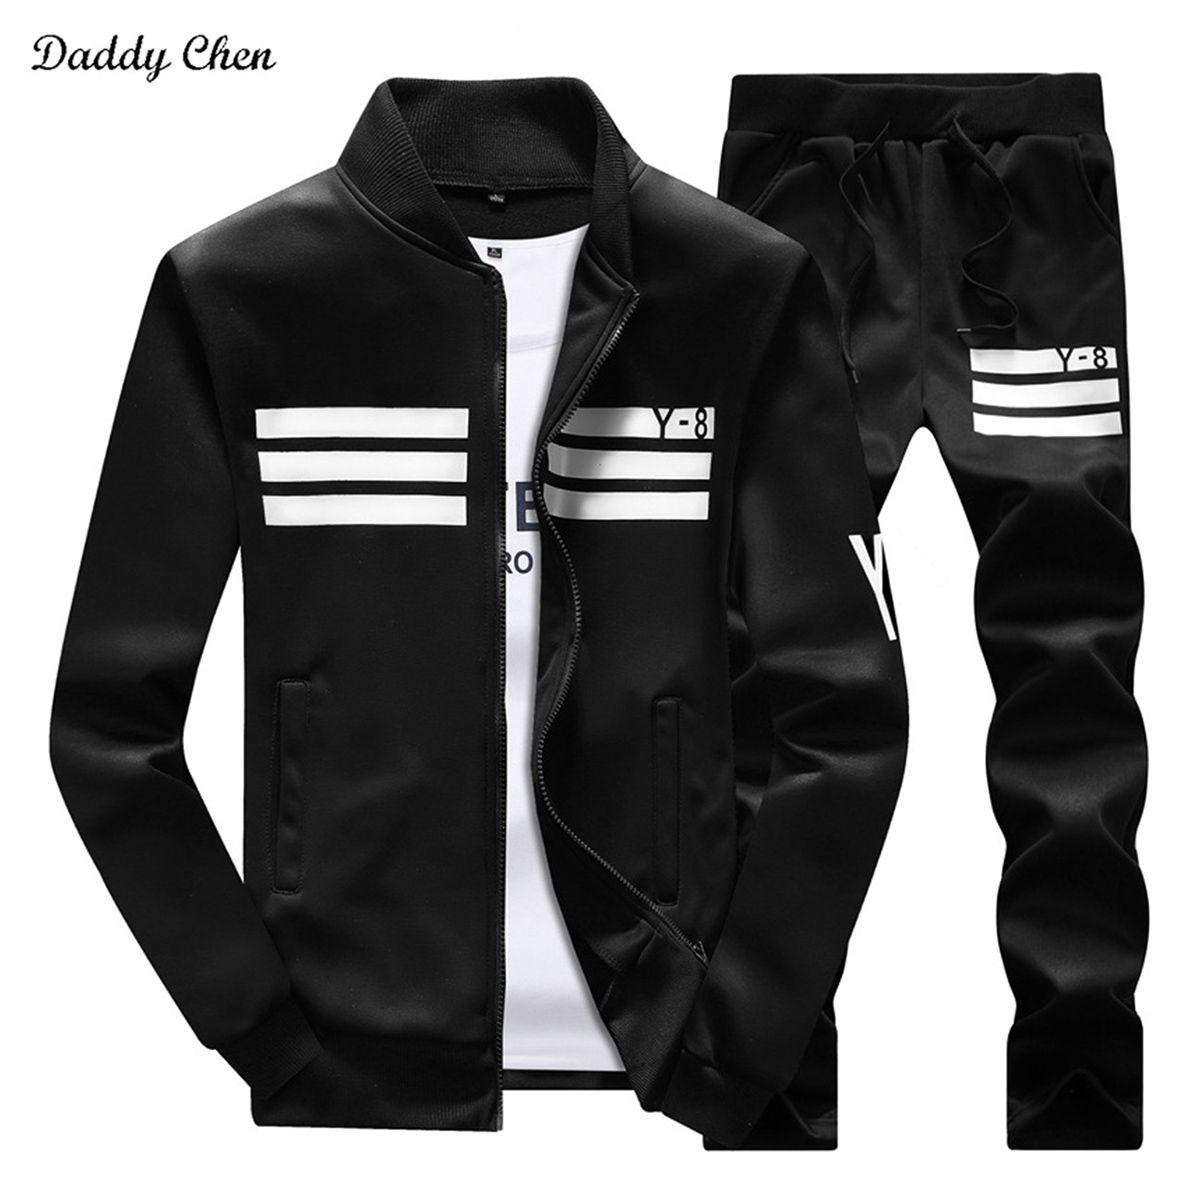 2017 Fashion Casual Men Tracksuit Set Hip Hop <font><b>Track</b></font> Suit Men Sportswear Stand Collar Coat Pants Costume Sets Fitness Plus Size